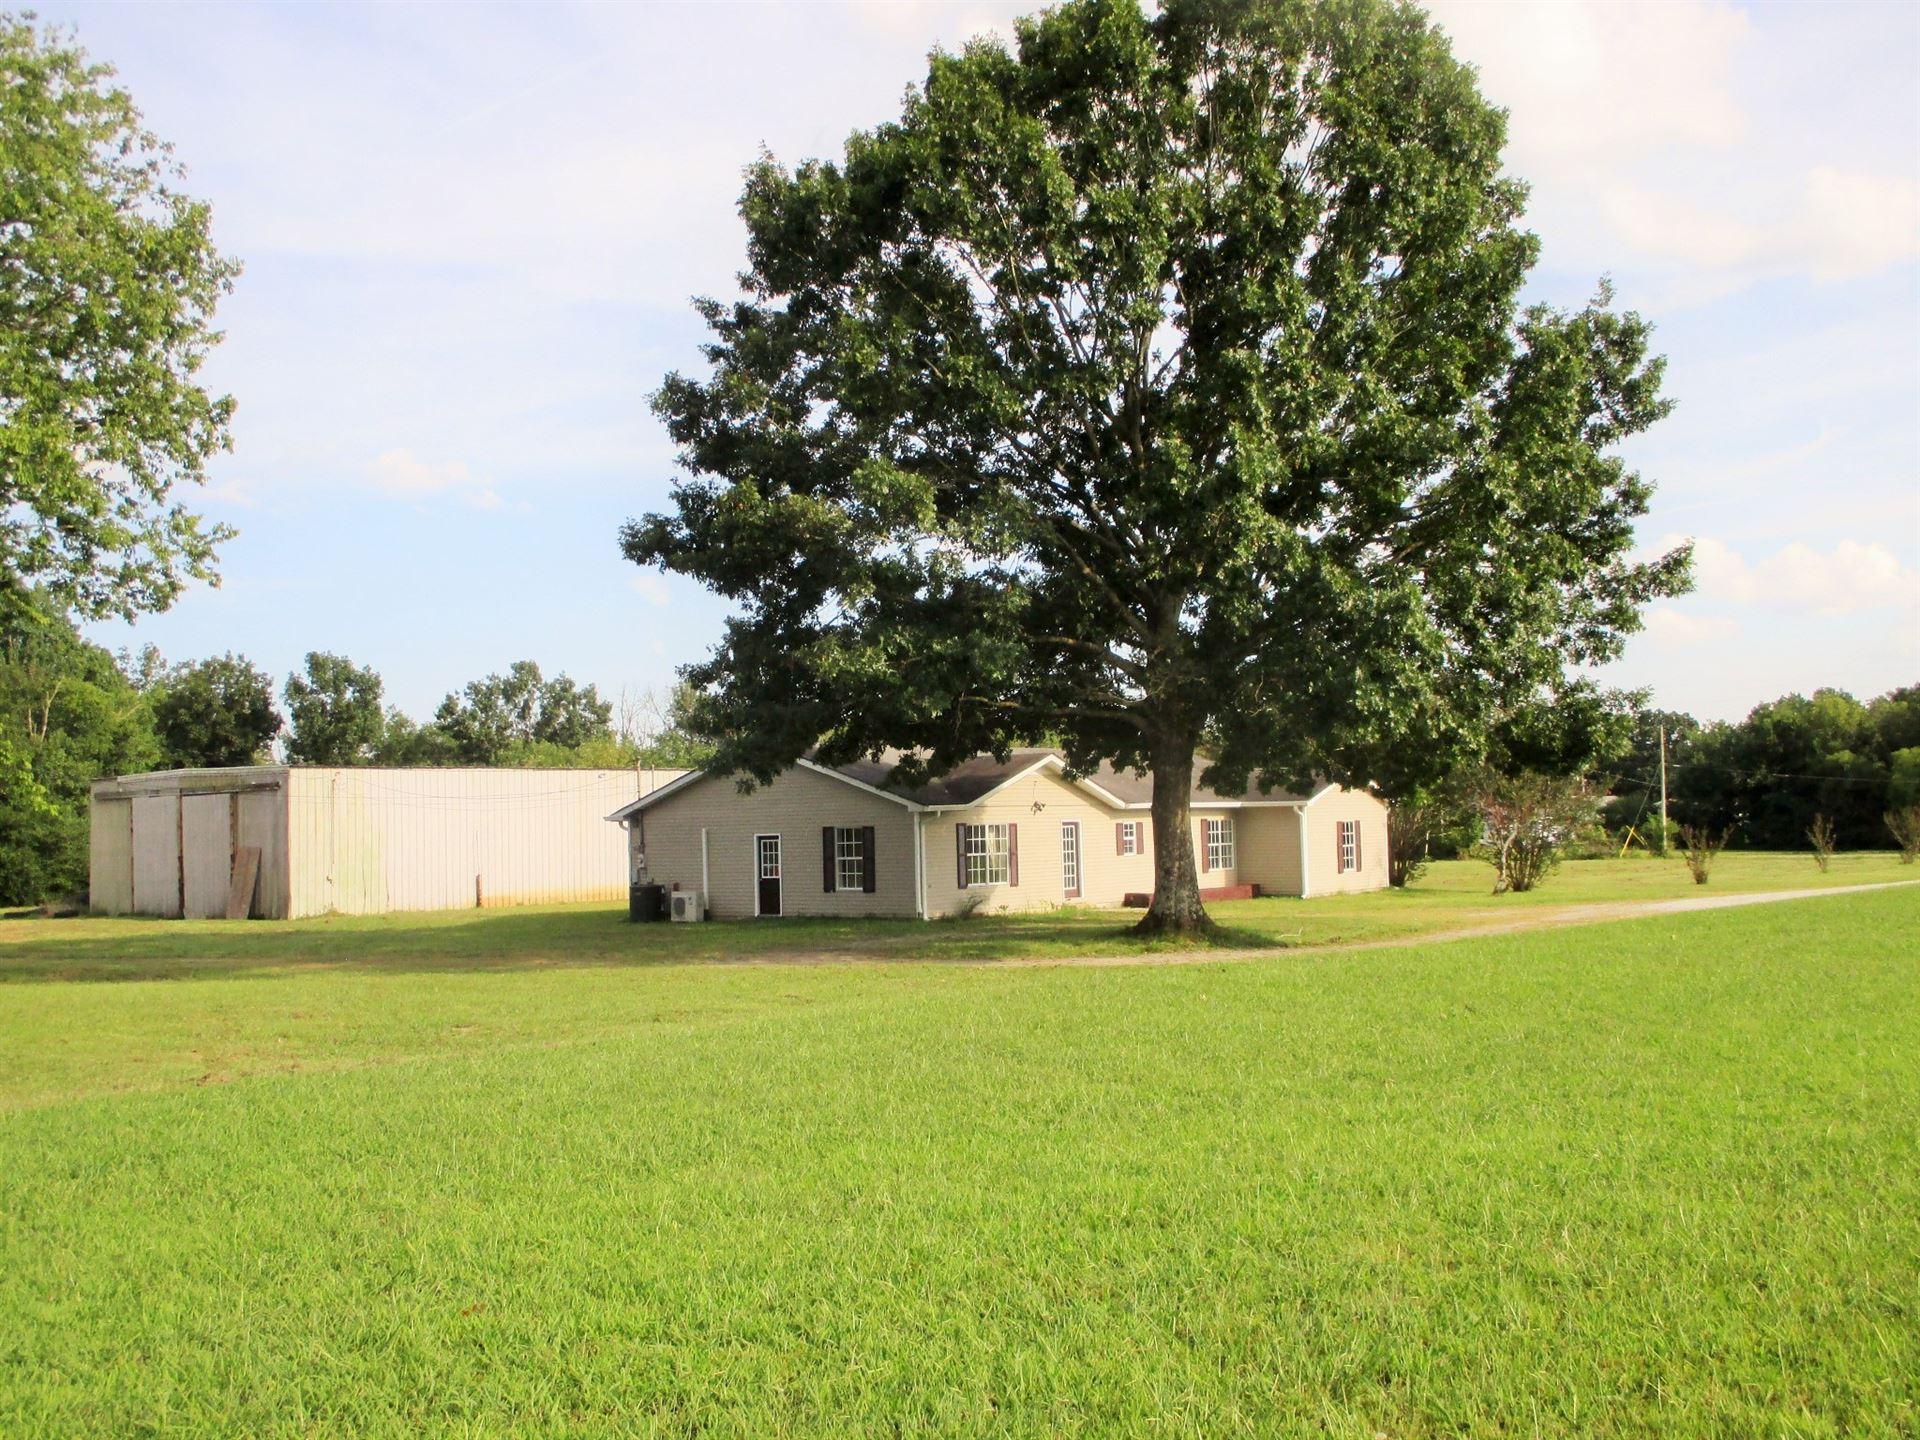 230 Reese St, Shelbyville, TN 37160 - MLS#: 2288625